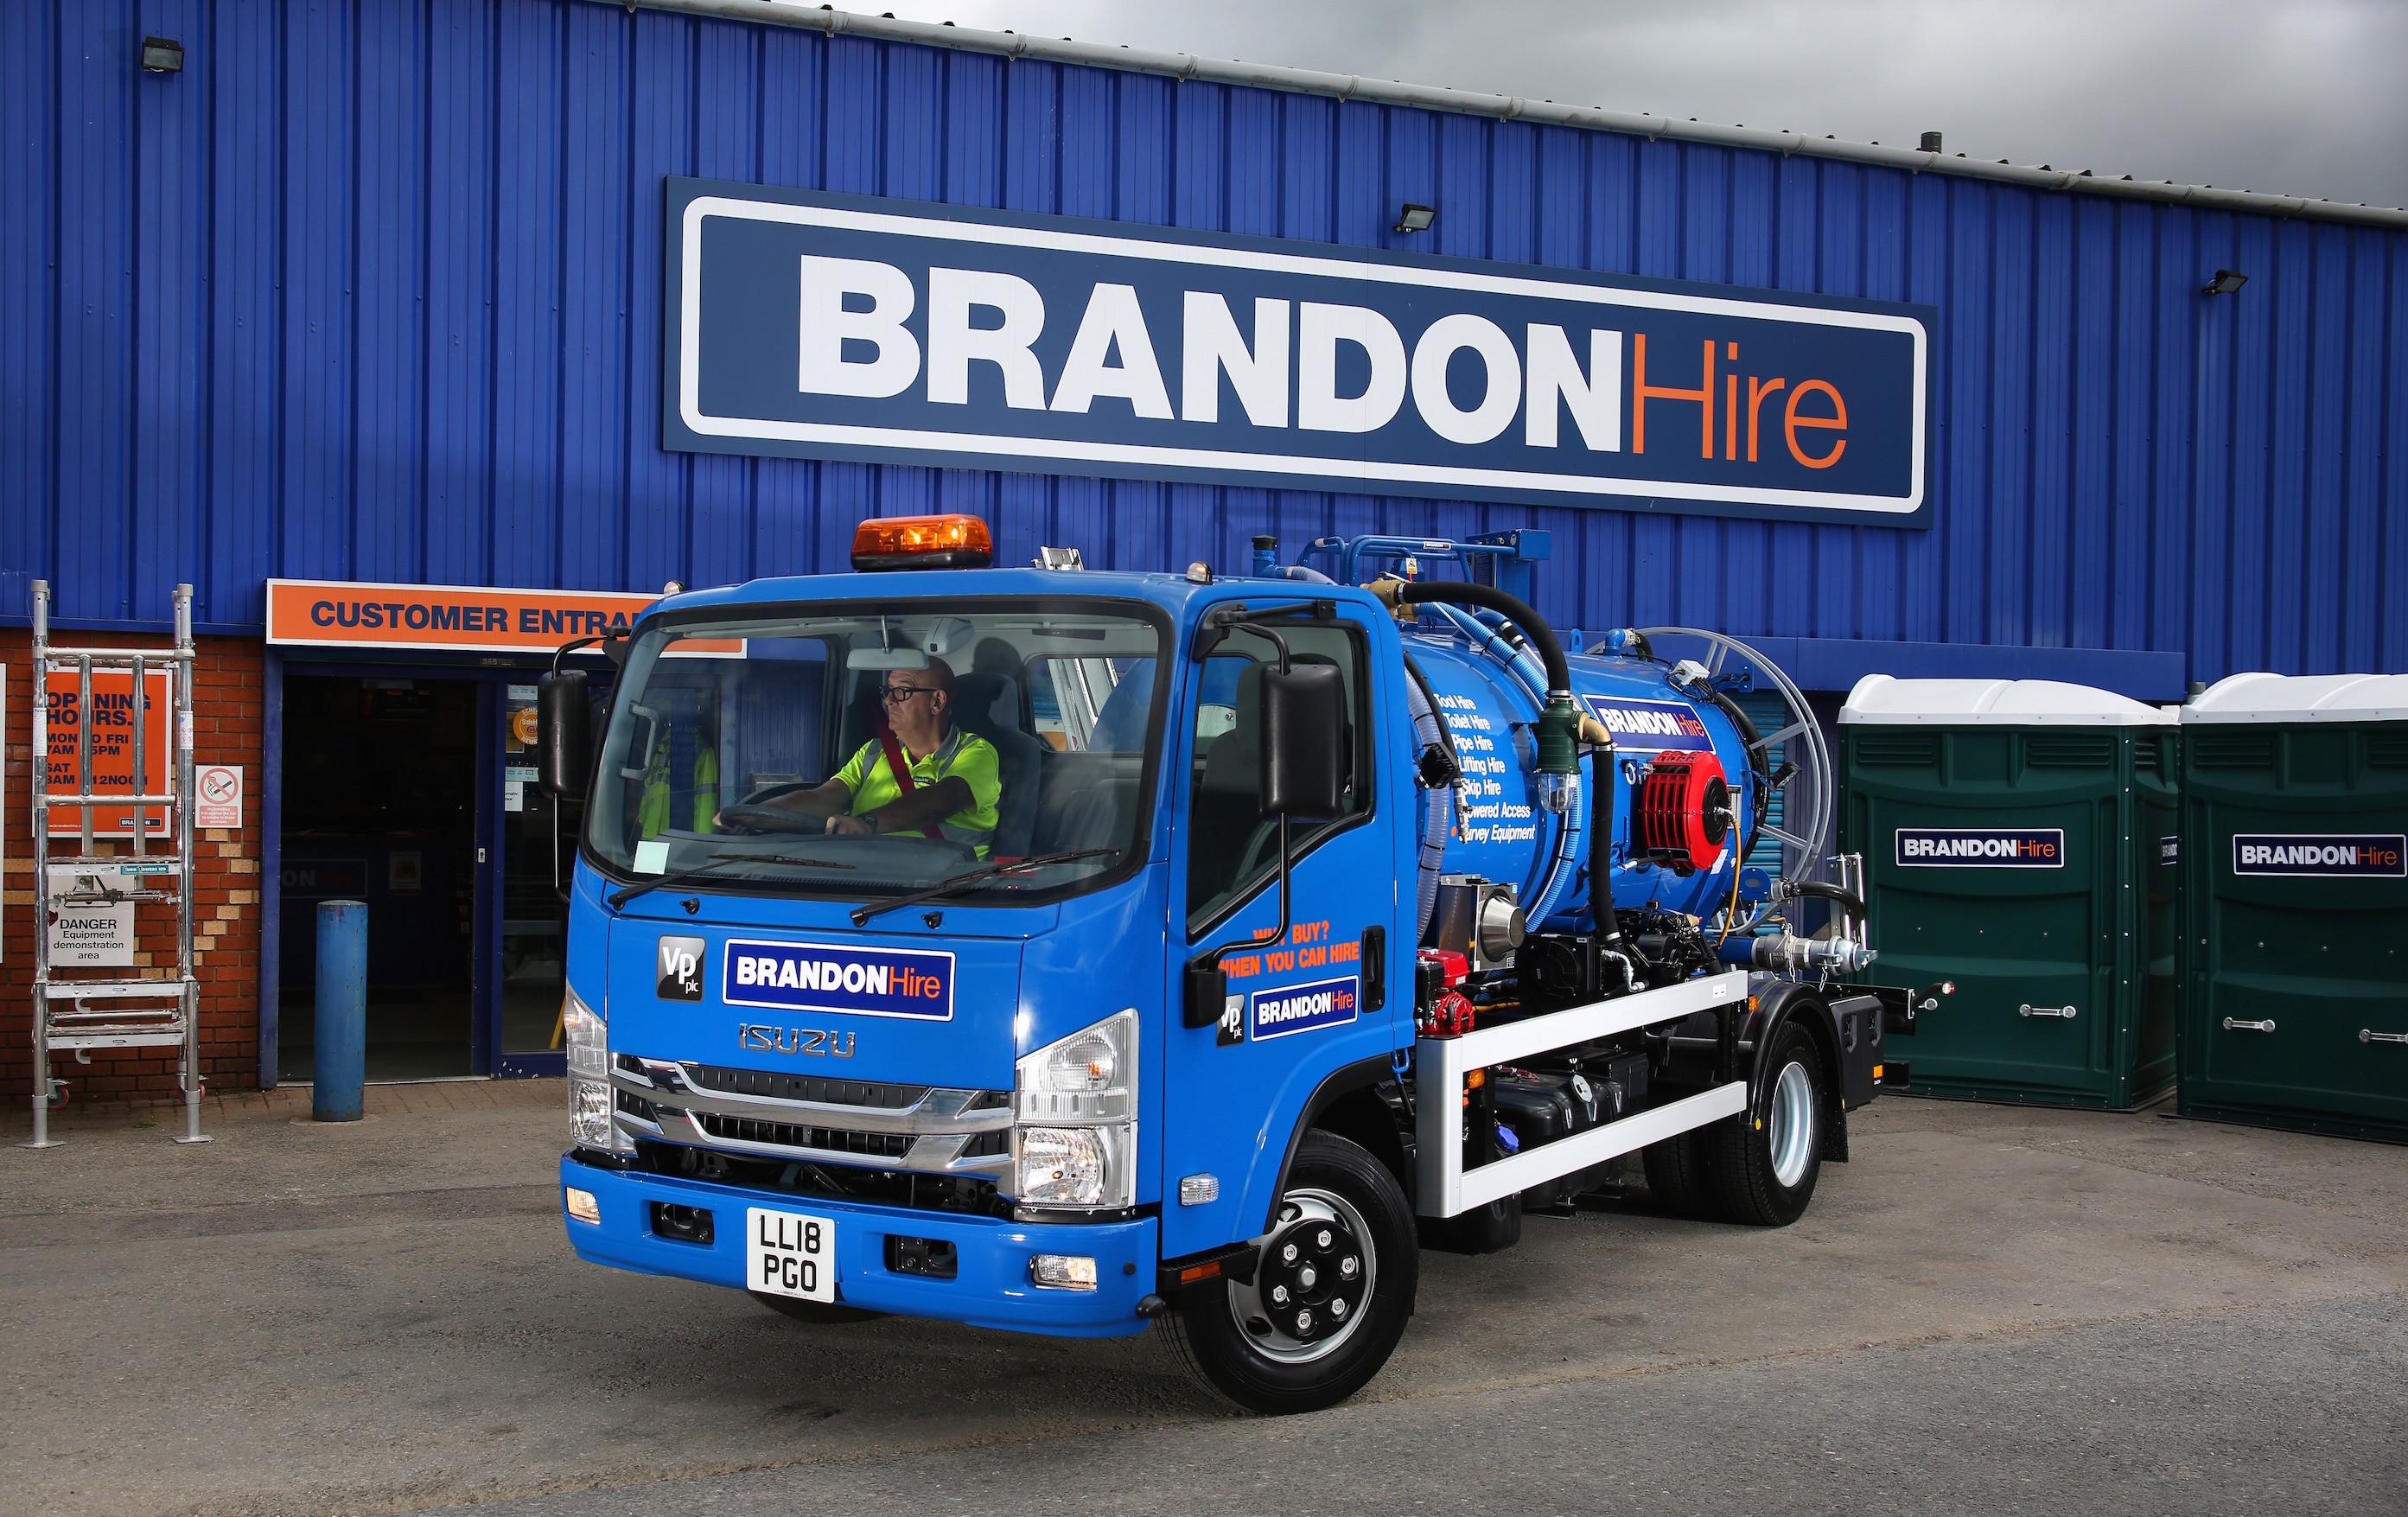 Brandon Hire Isuzu truck